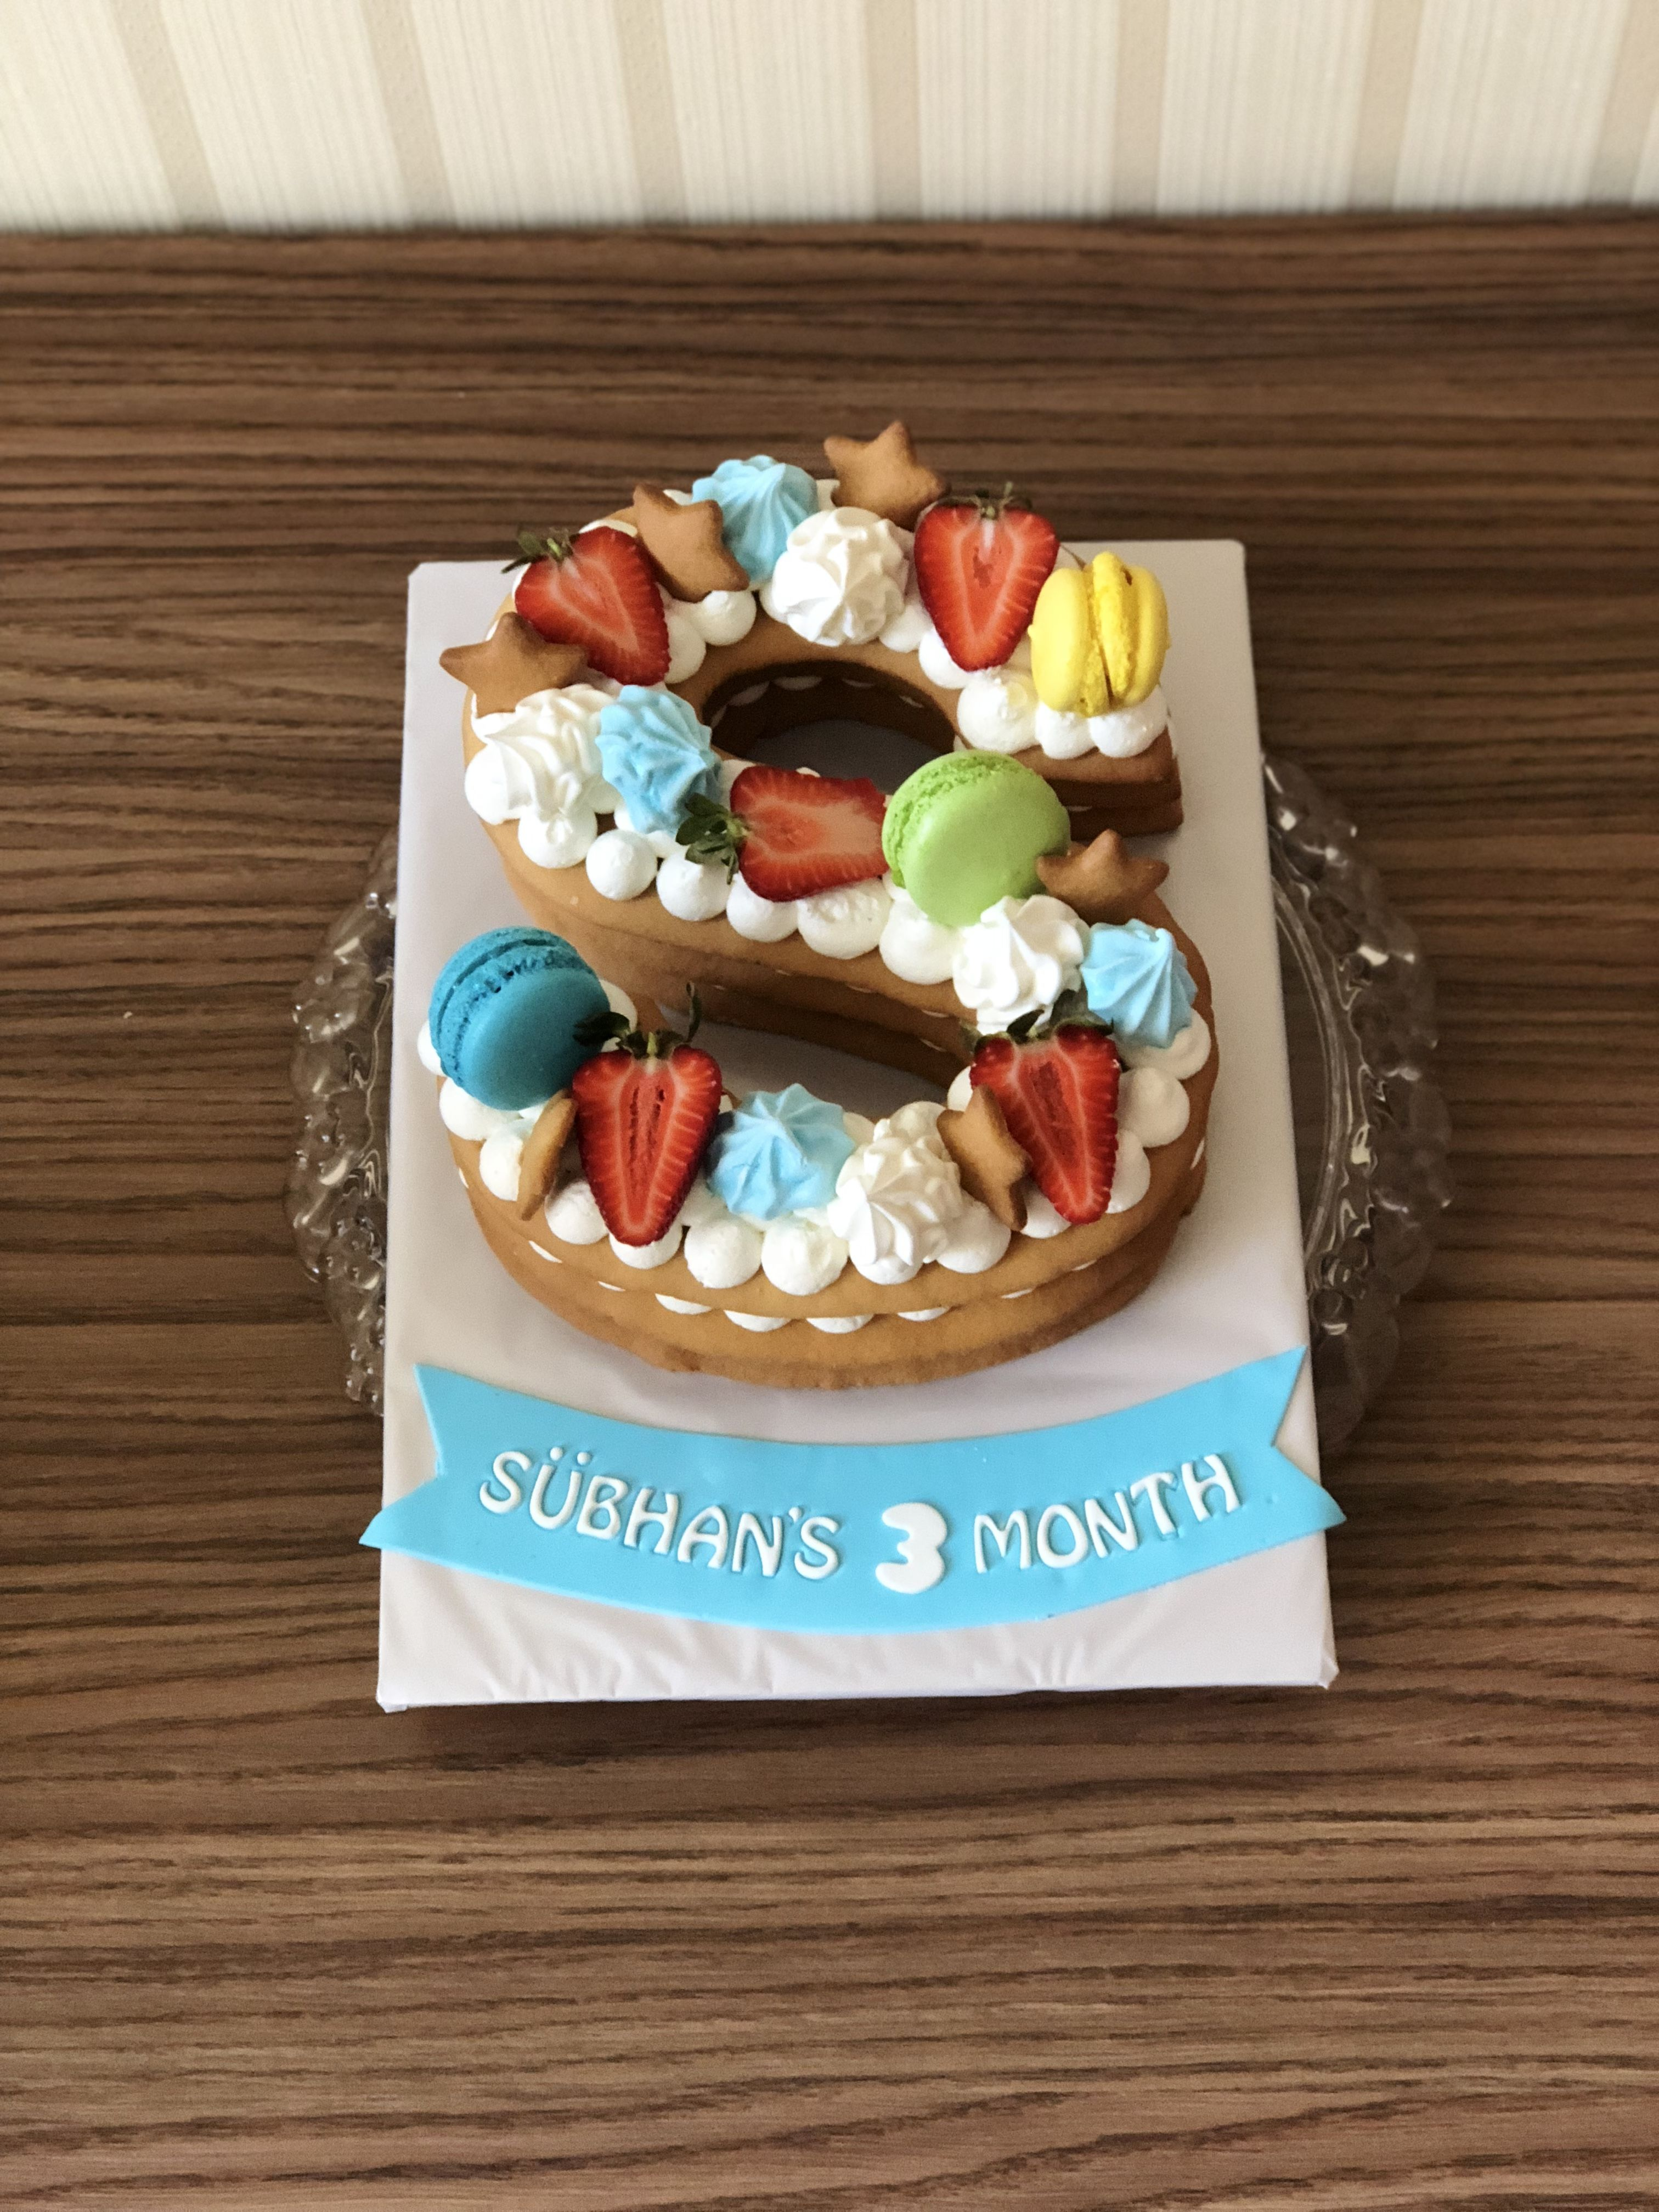 Letter Cakes Cakes In 2019 Cake Birthday Cake Desserts